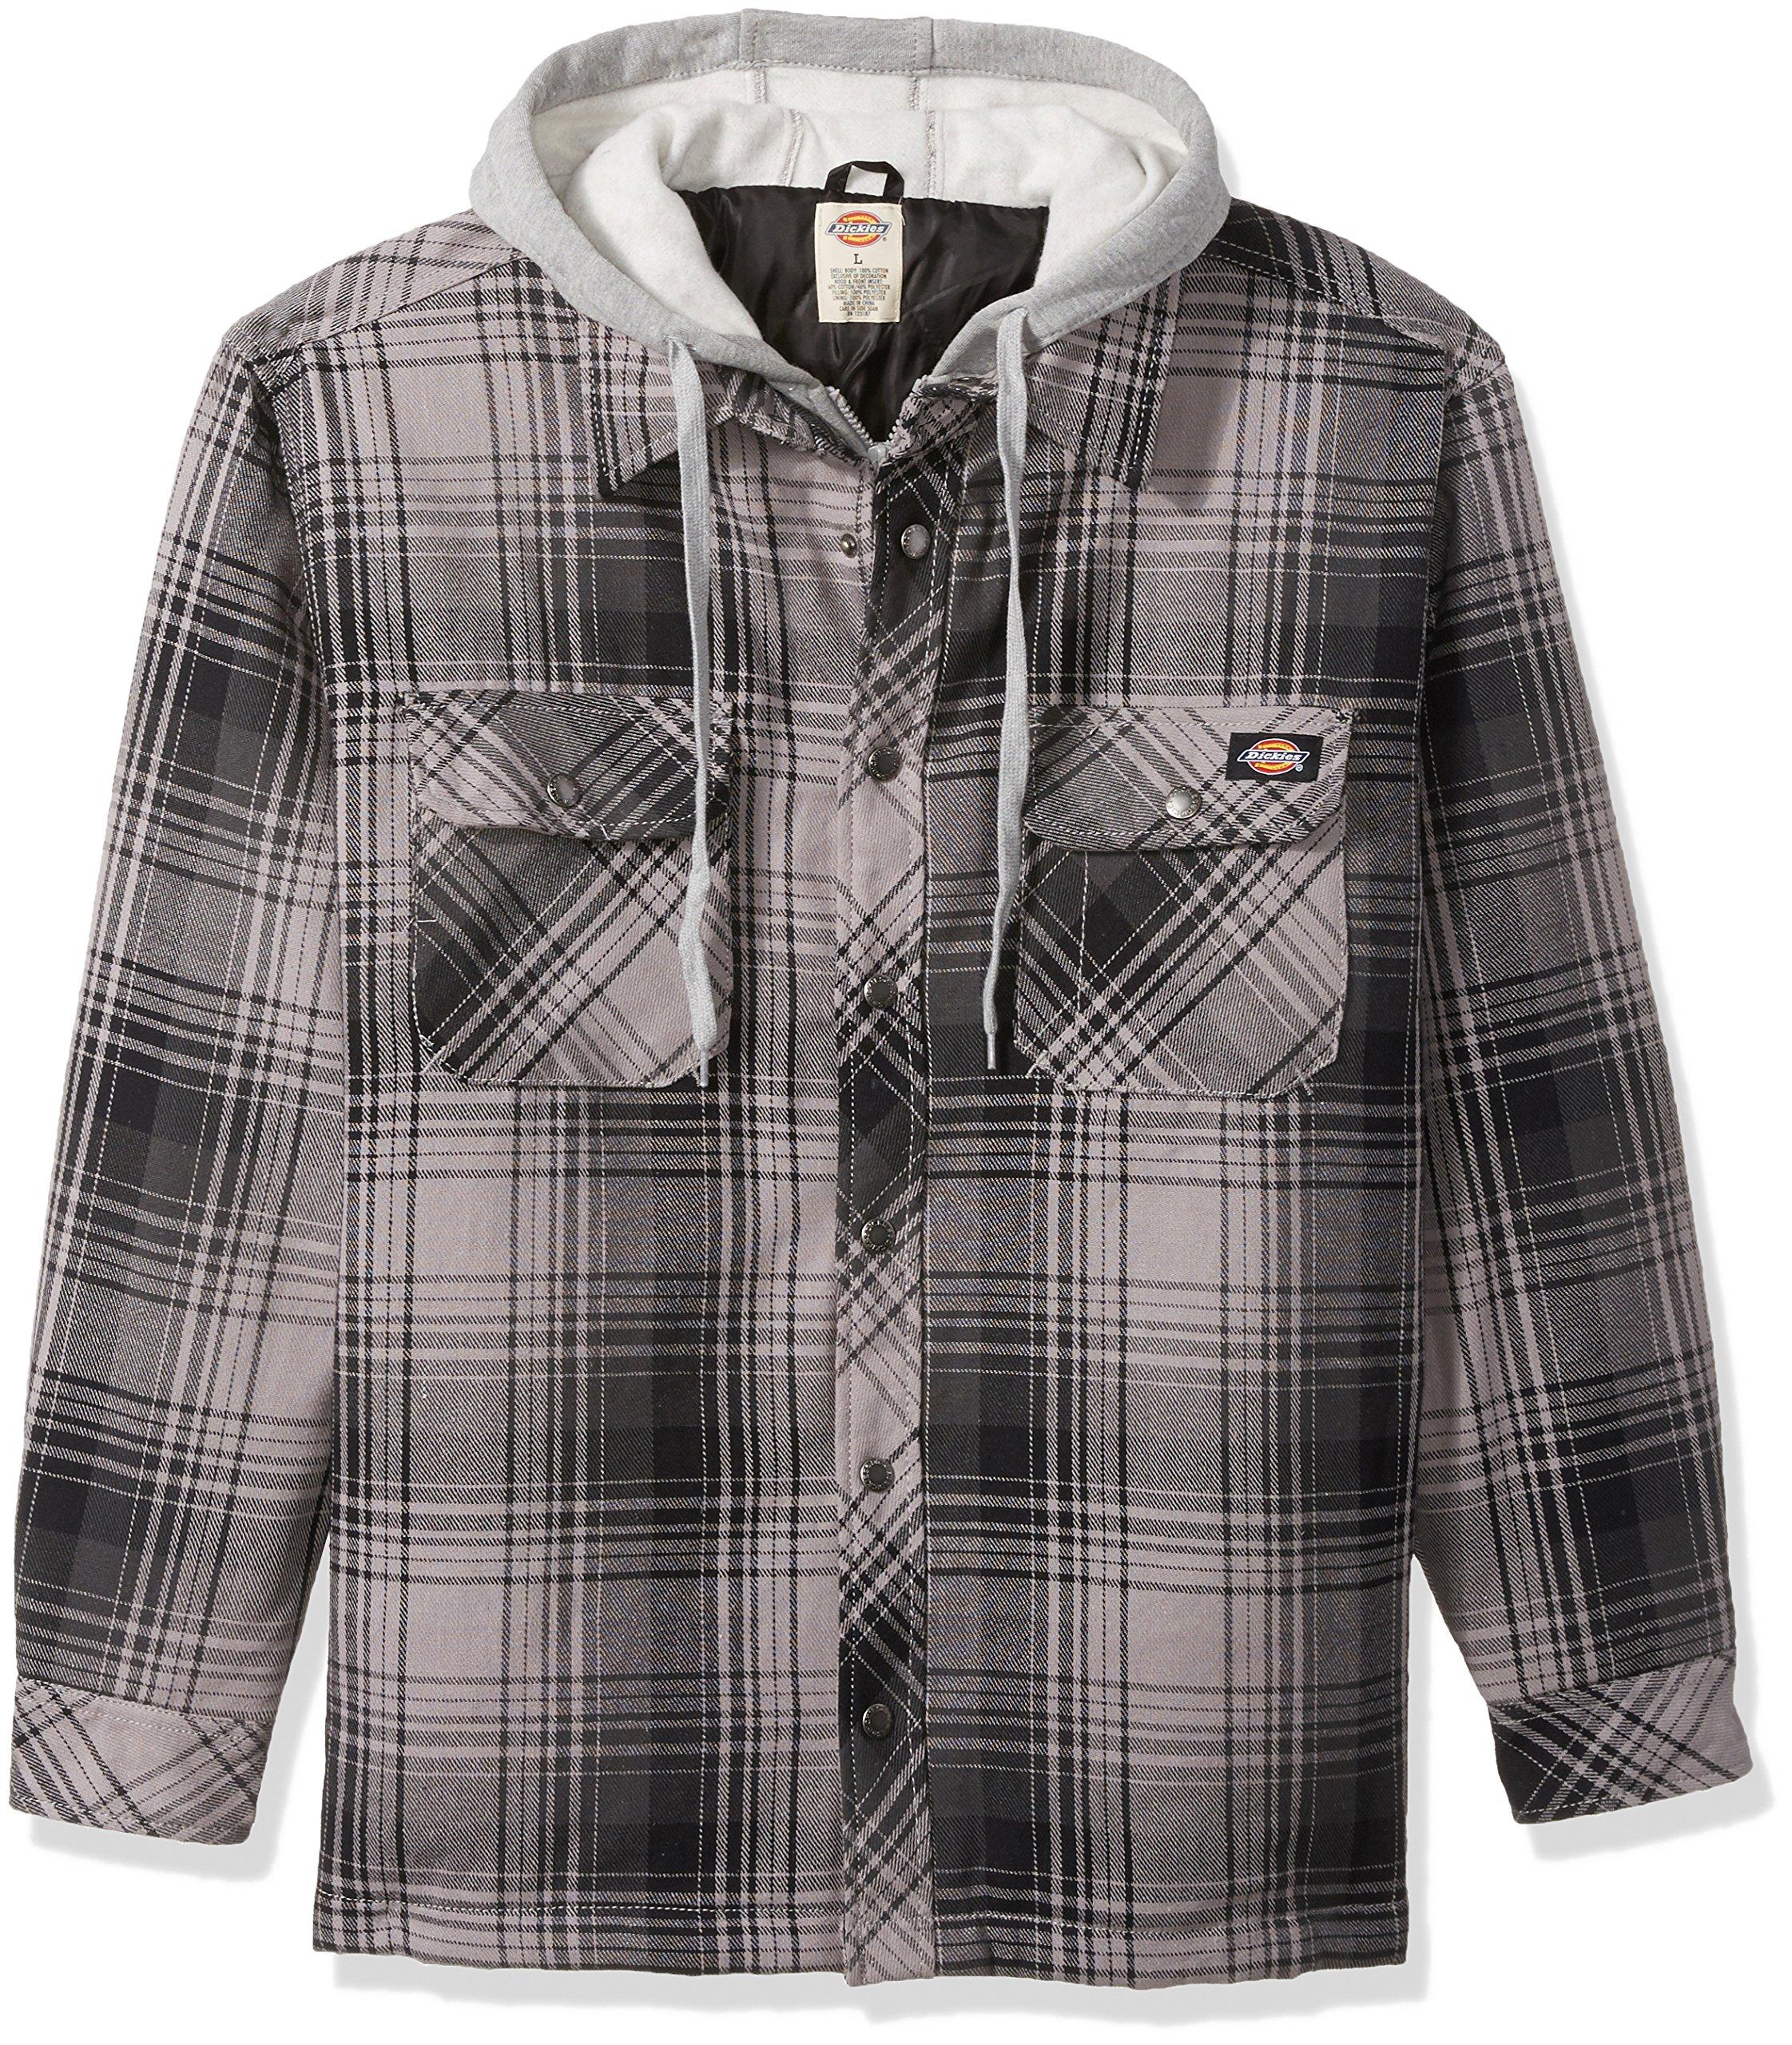 Dickies Men's Relaxed Fit Hooded Yarn Dye Plaid Shirt Jacket, Black/Smoke, Large